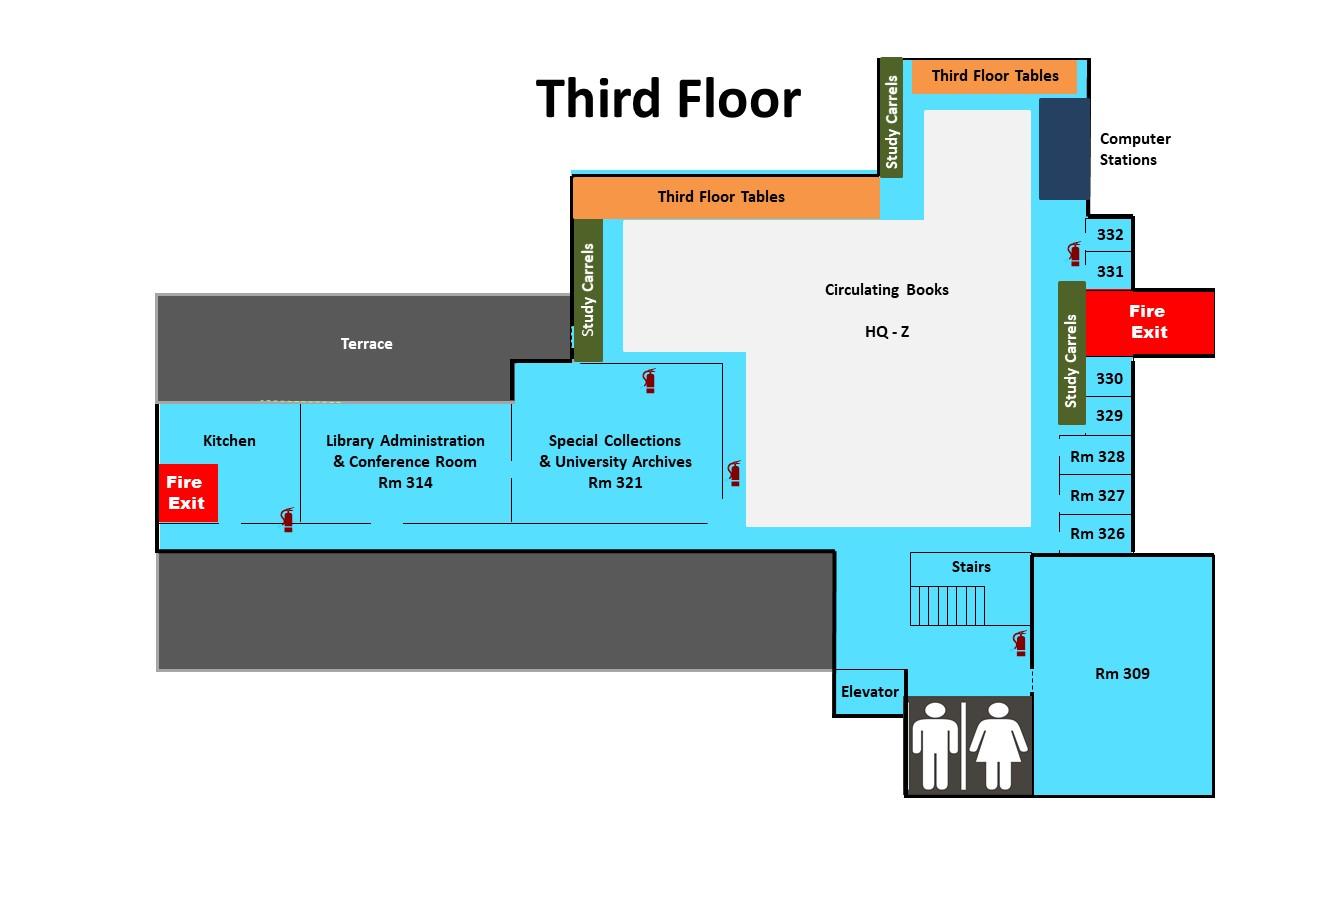 Third floor library materials